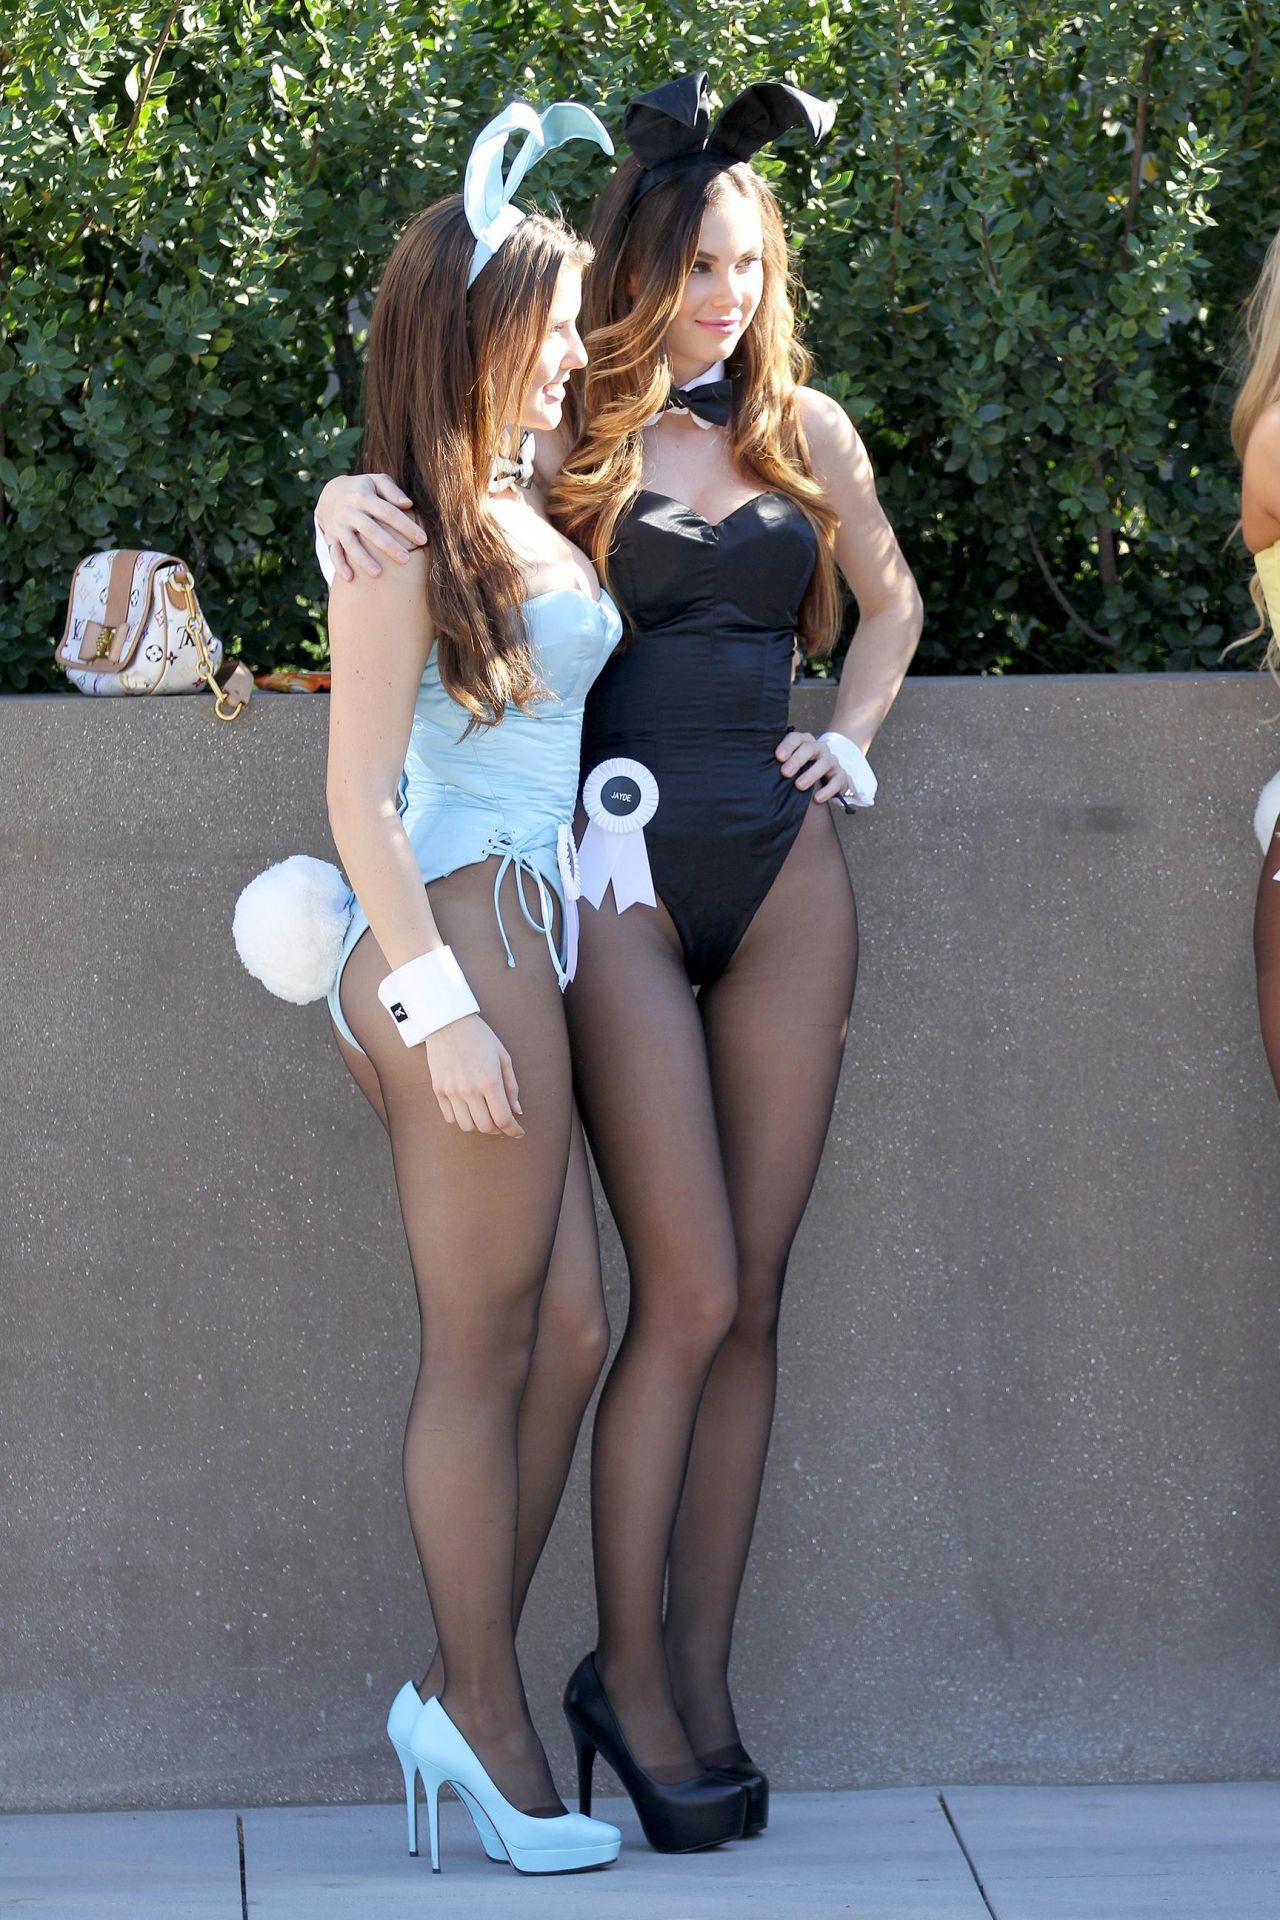 Jayde Nicole – Dressed as a Playboy Bunny, January 2014